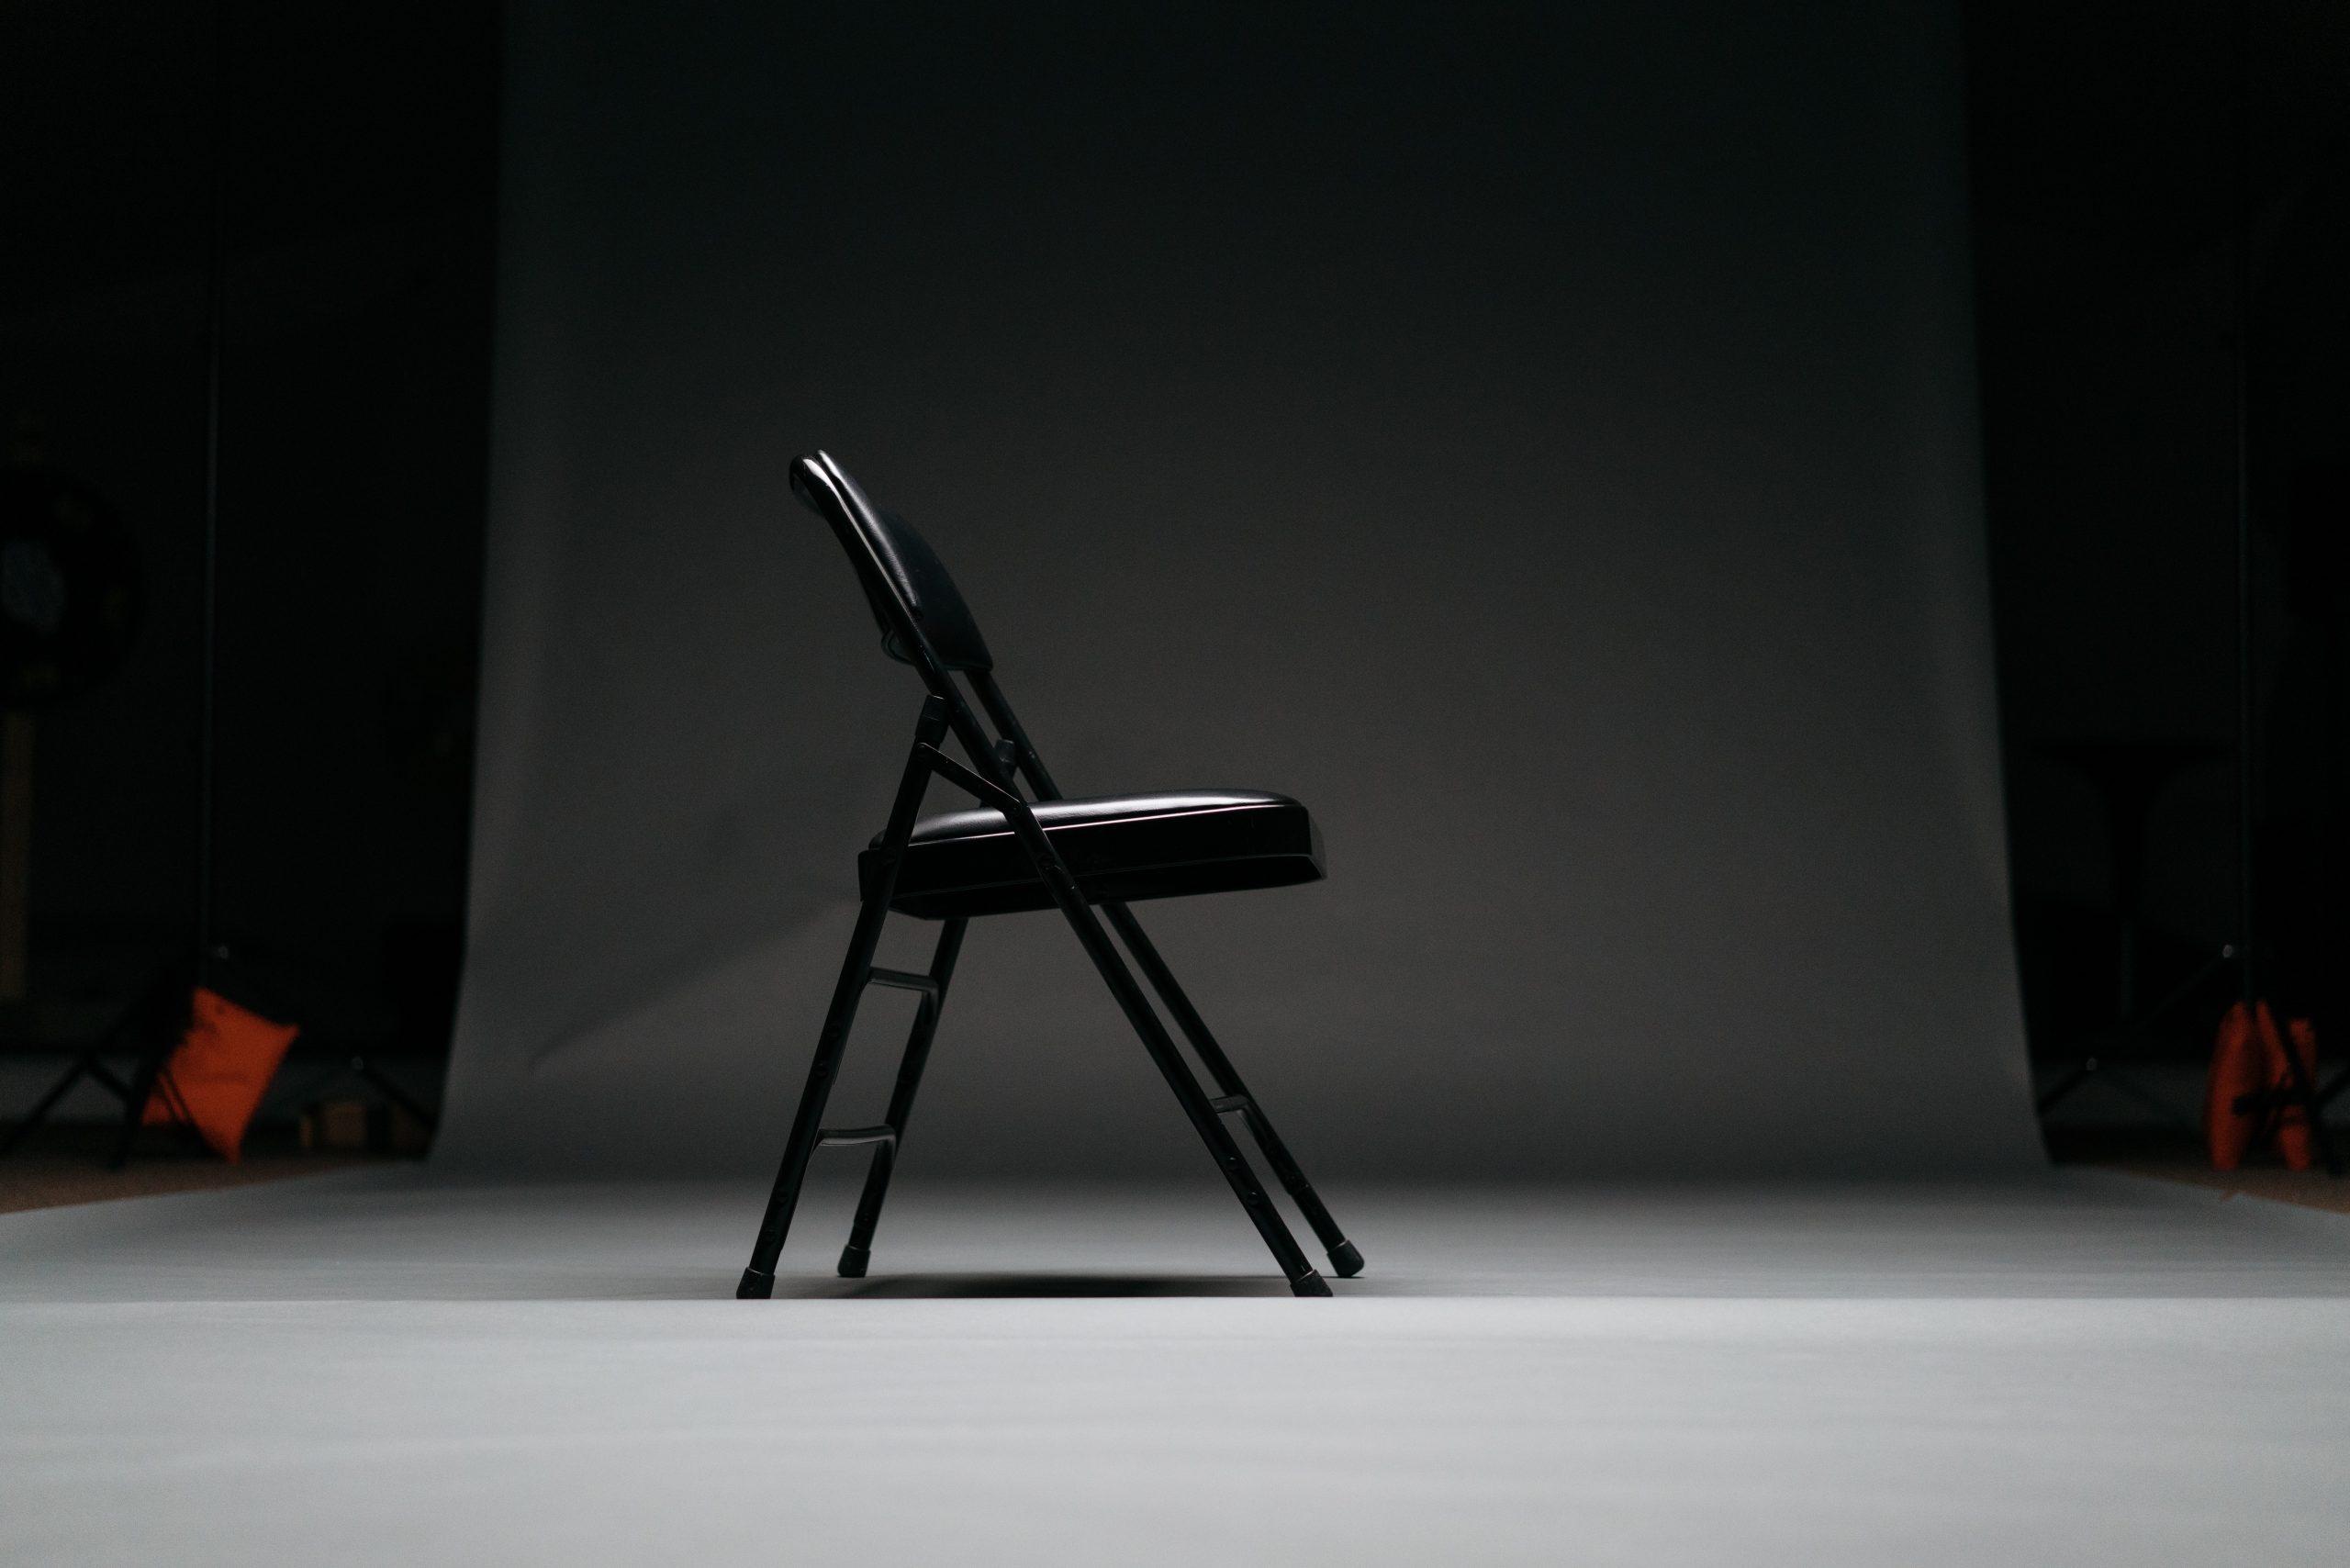 keagan-henman-iFBIdX54BOk-unsplash